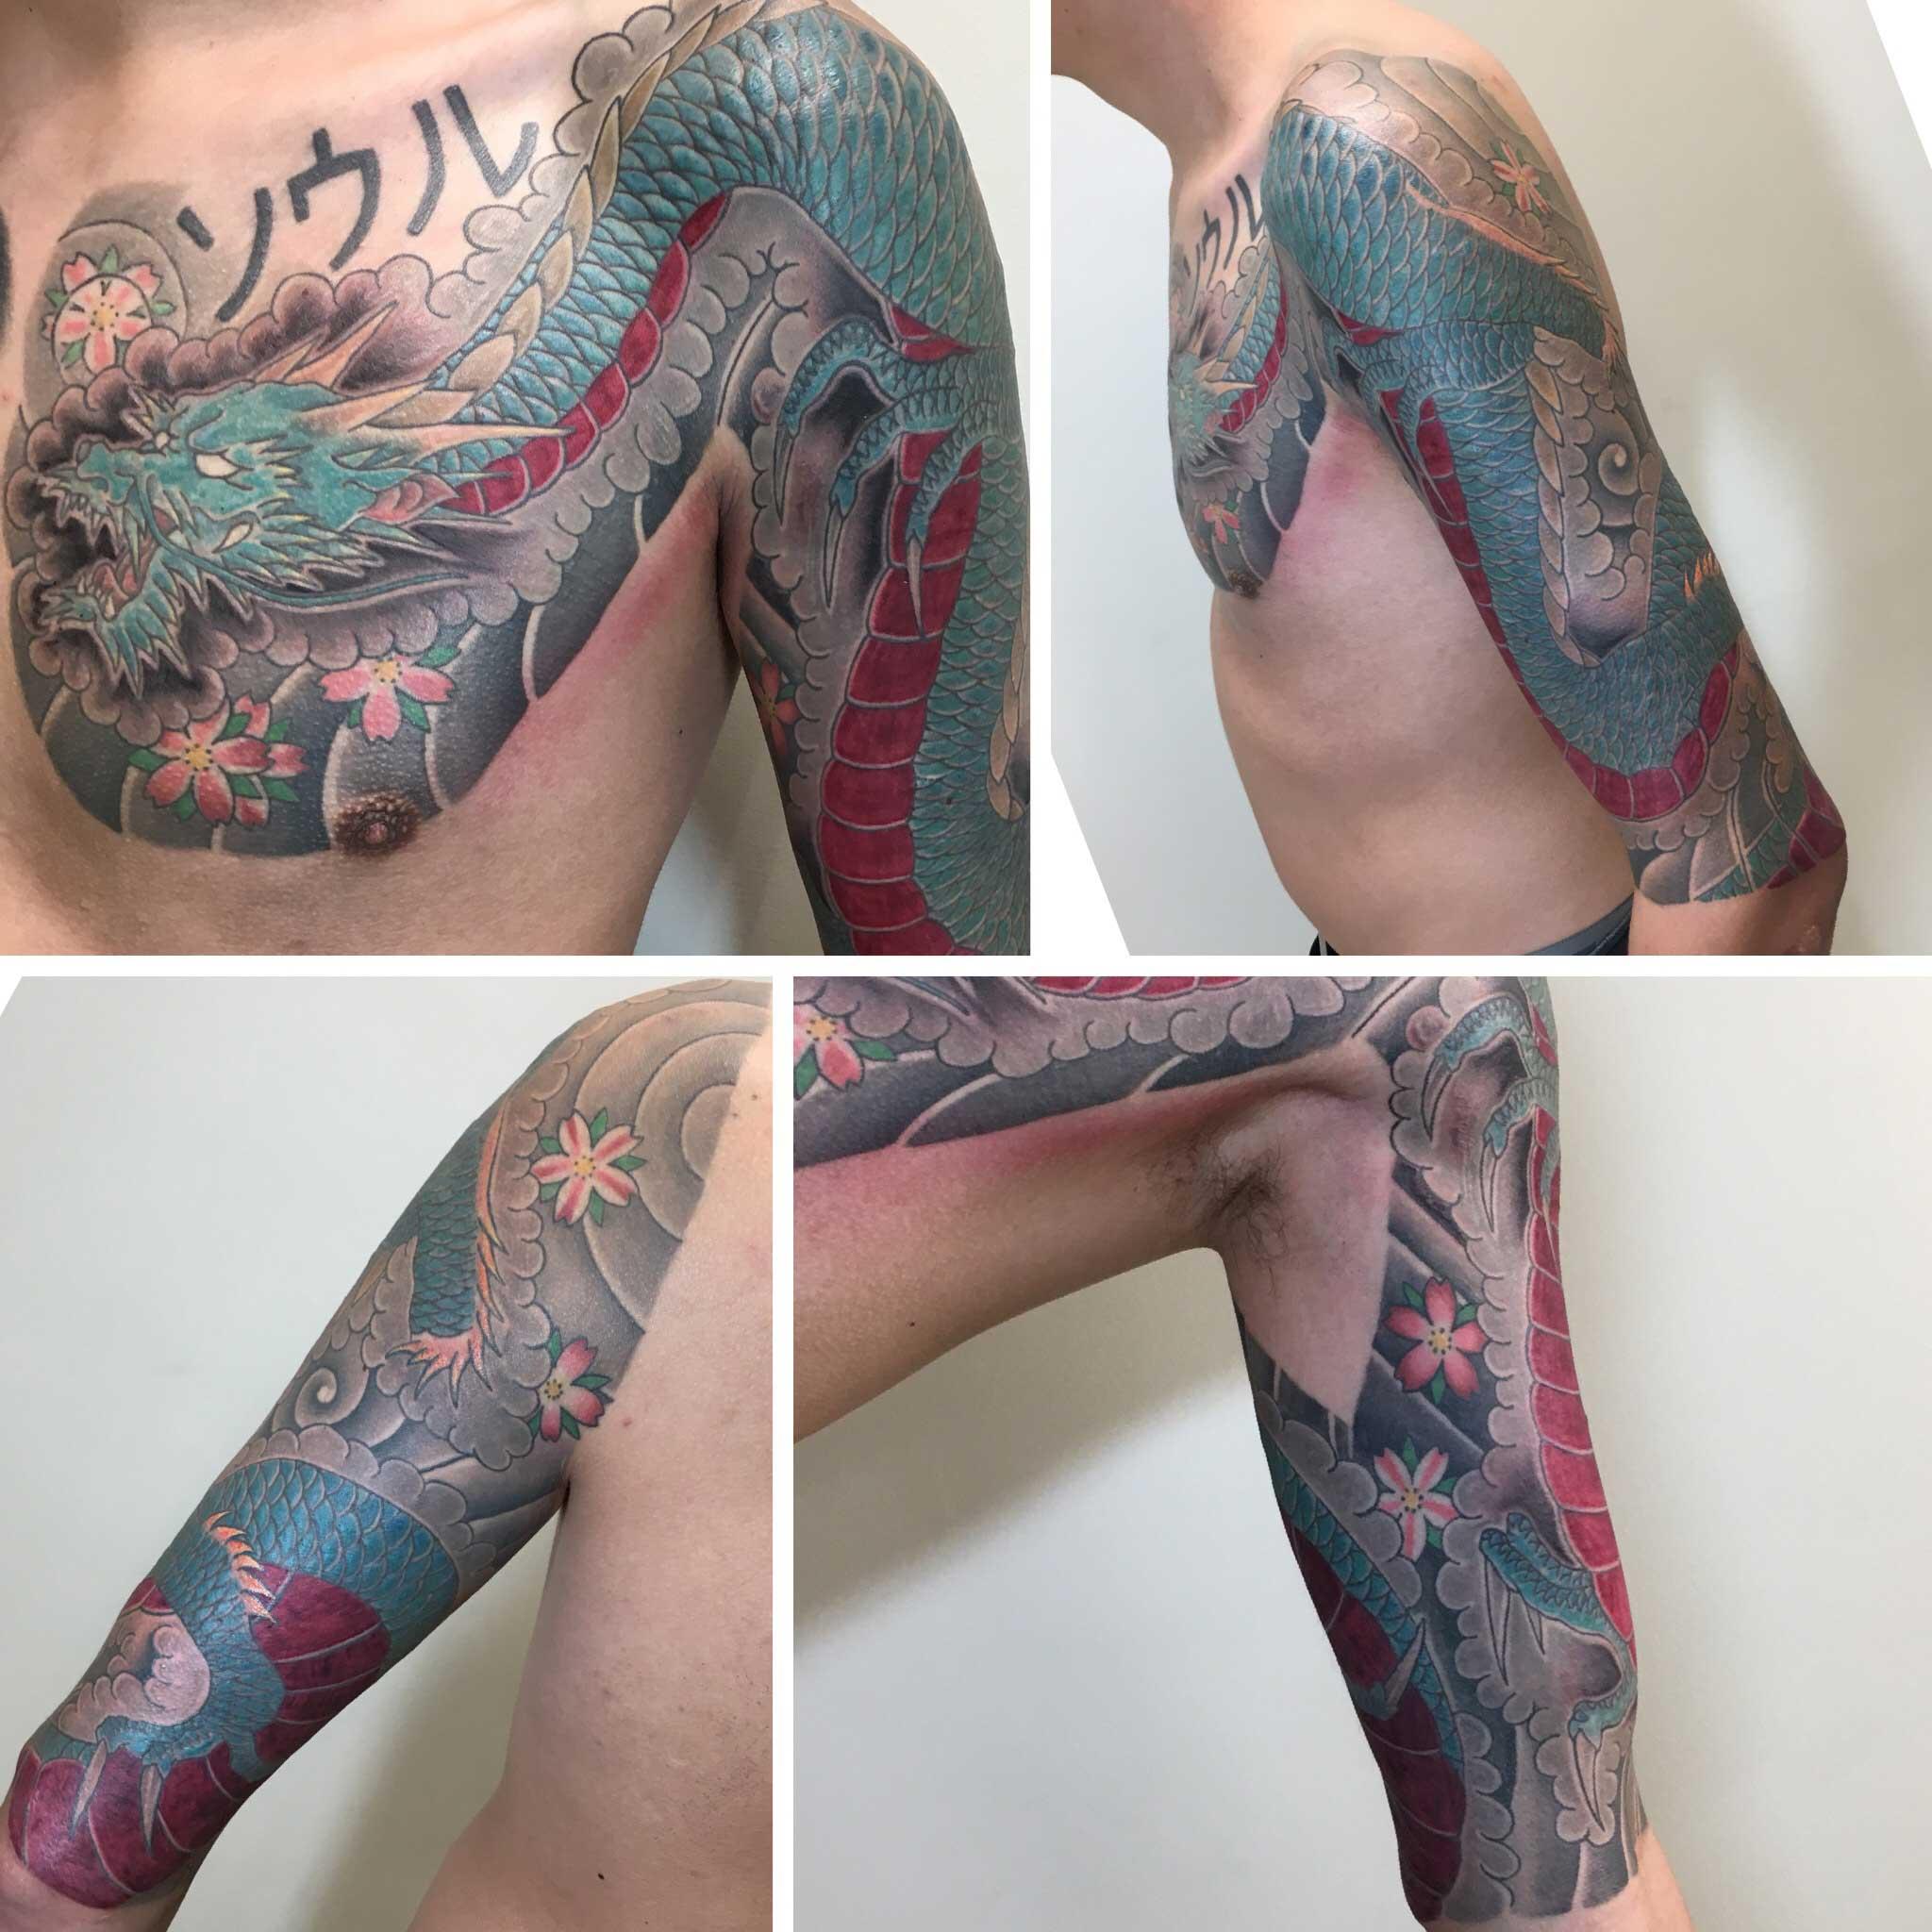 Japanese Style Tattoo Artist Ei Omiya at Funhouse Tattoo in San Diego